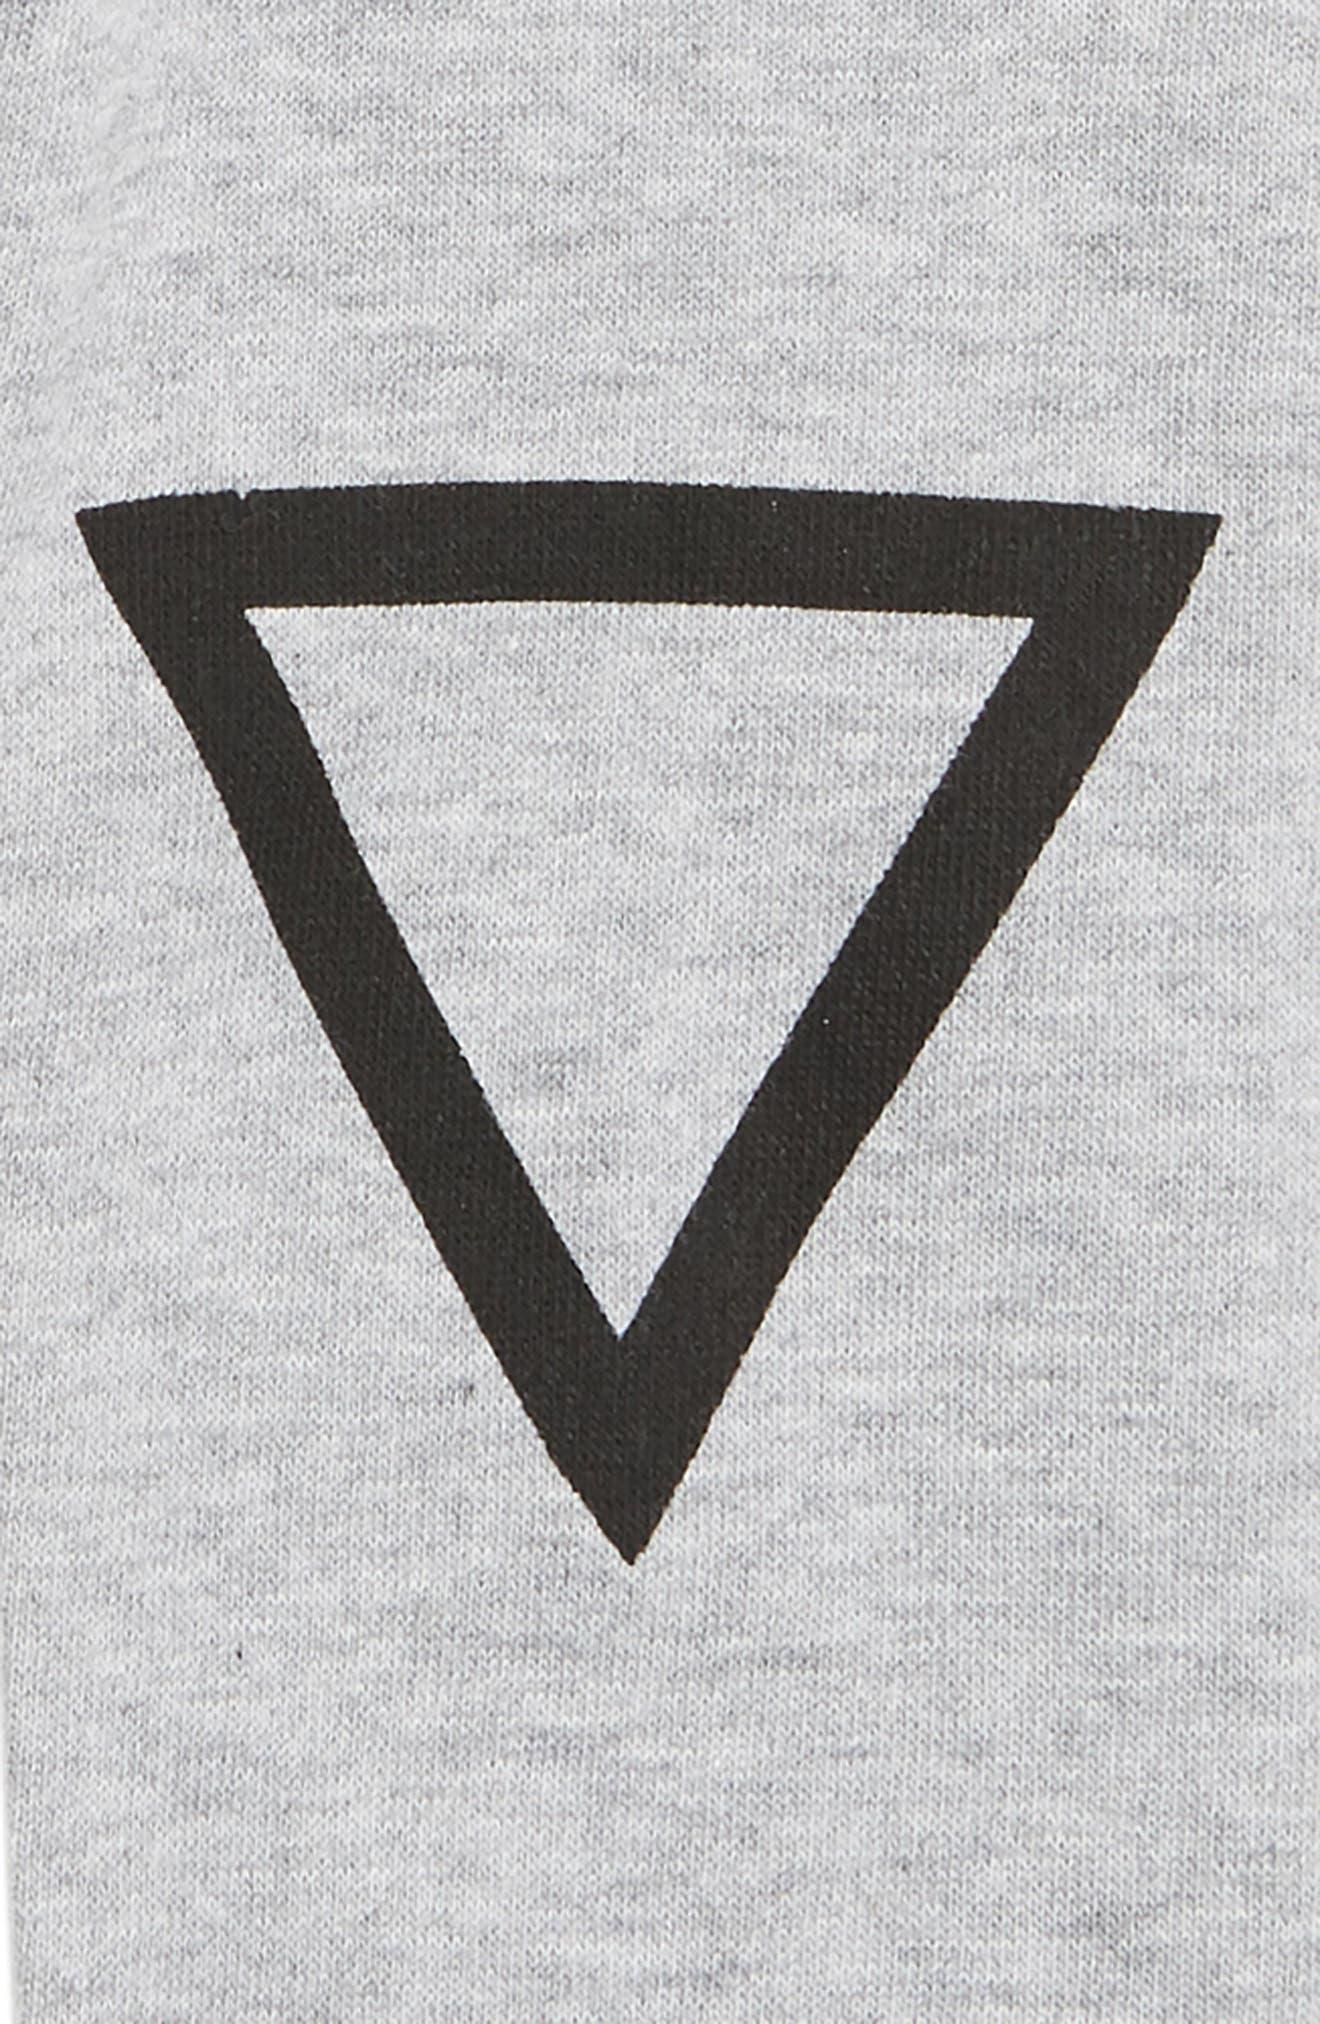 Triangle Sweatpants,                             Alternate thumbnail 3, color,                             001